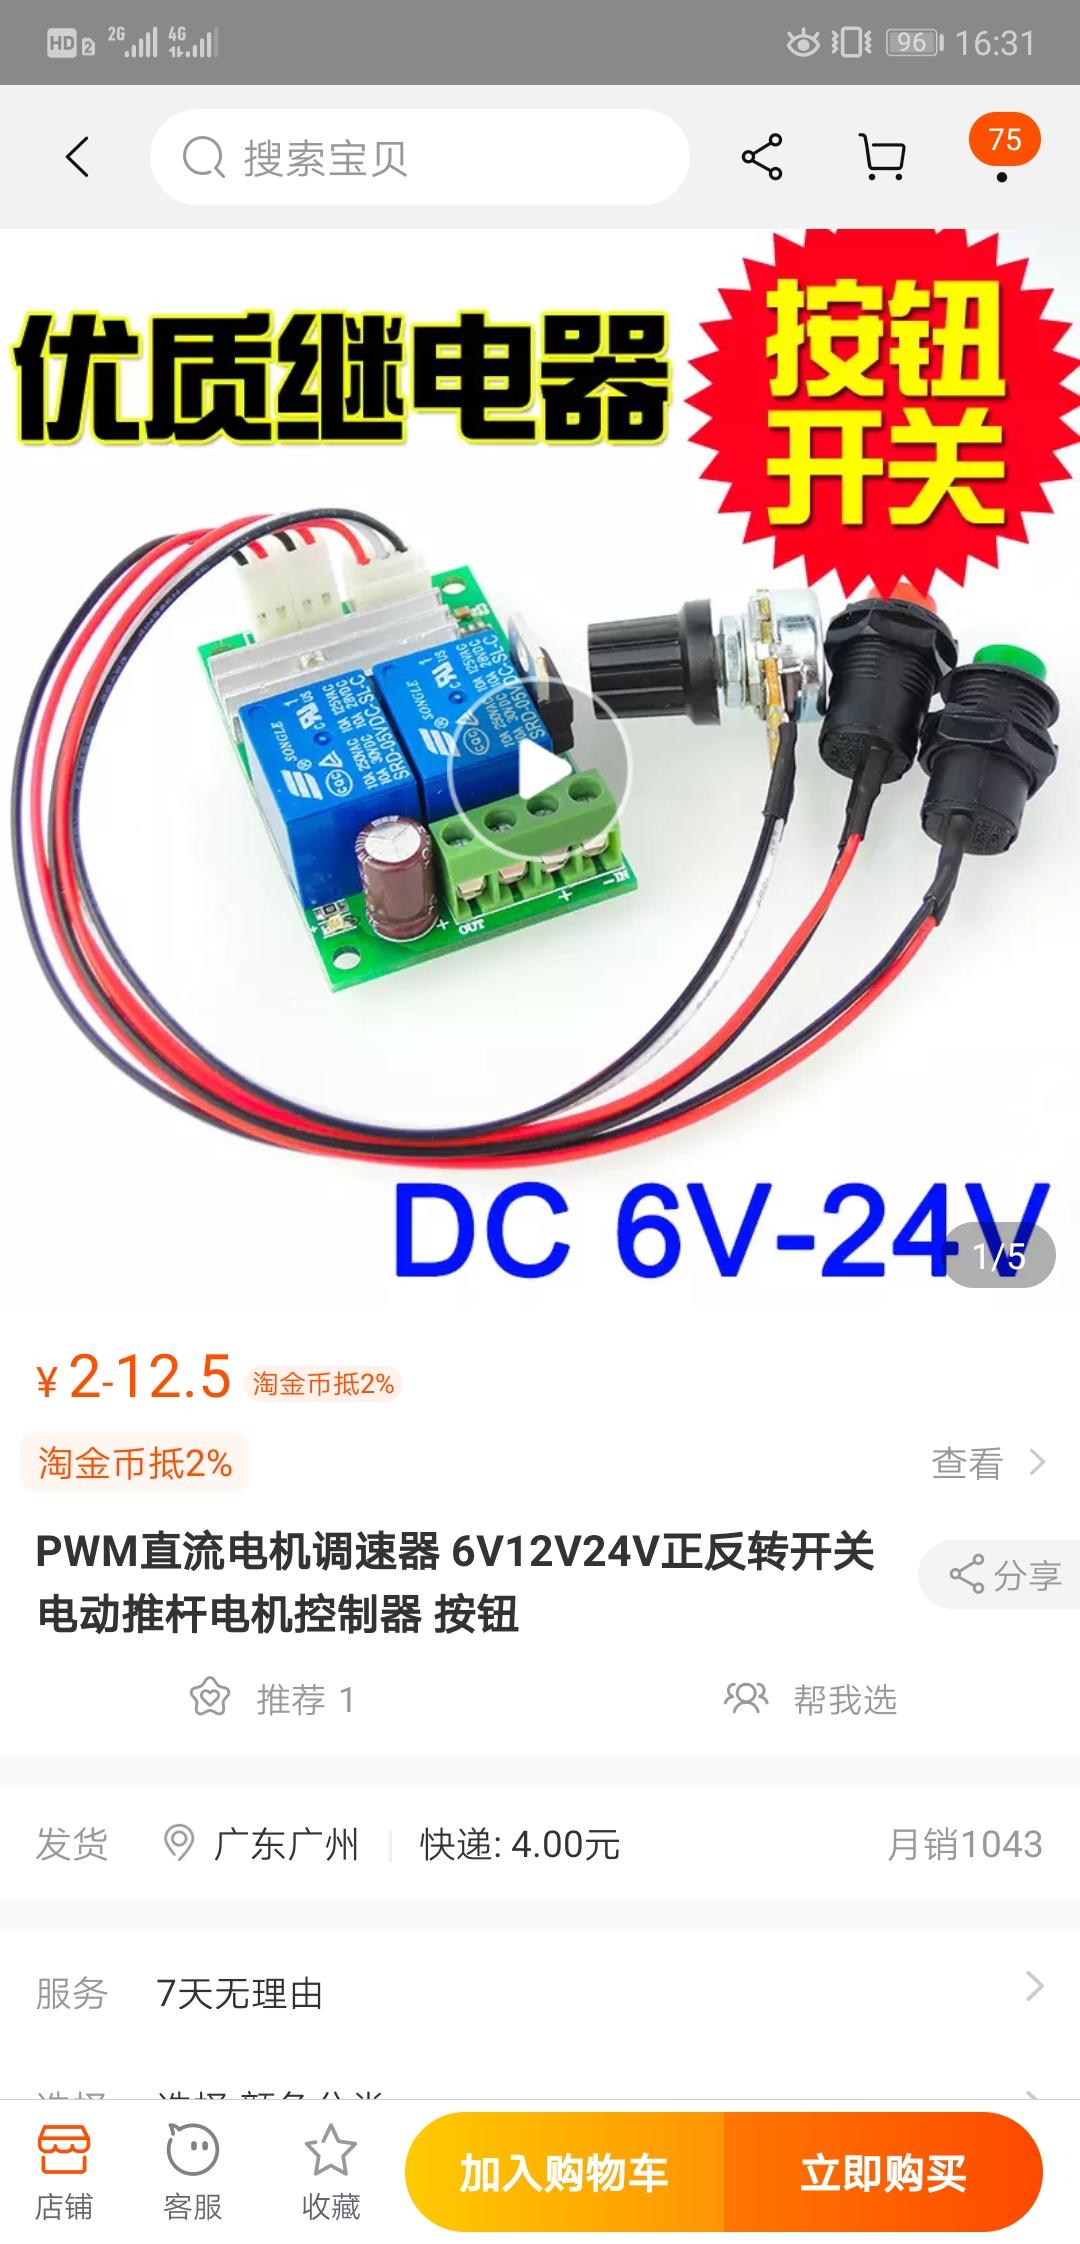 Screenshot_20191102_163124_com.taobao.taobao.jpg